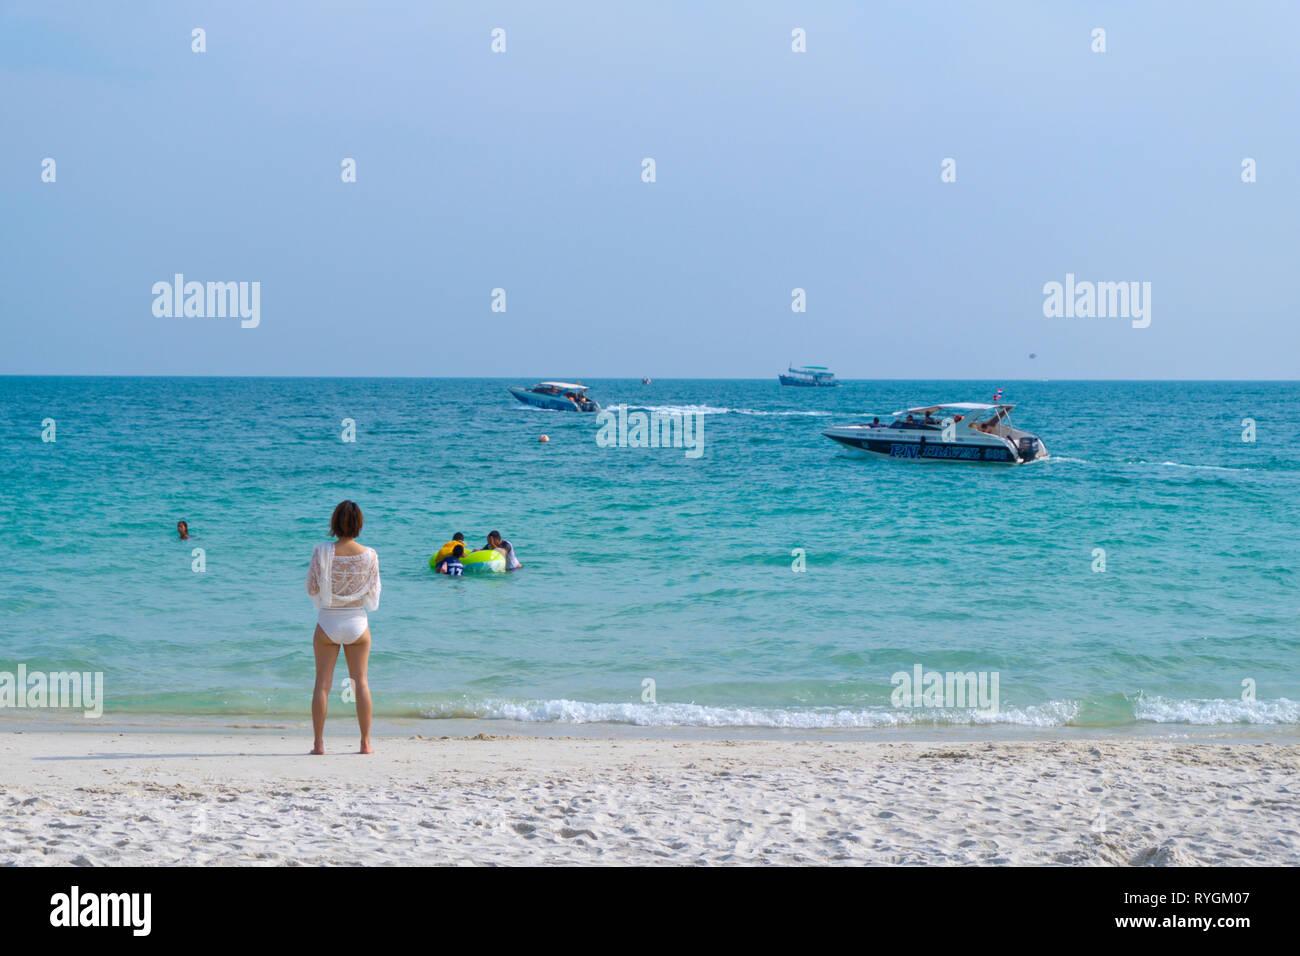 Sai Kaew Beach Ko Samet Thailand Stock Photo 240697415